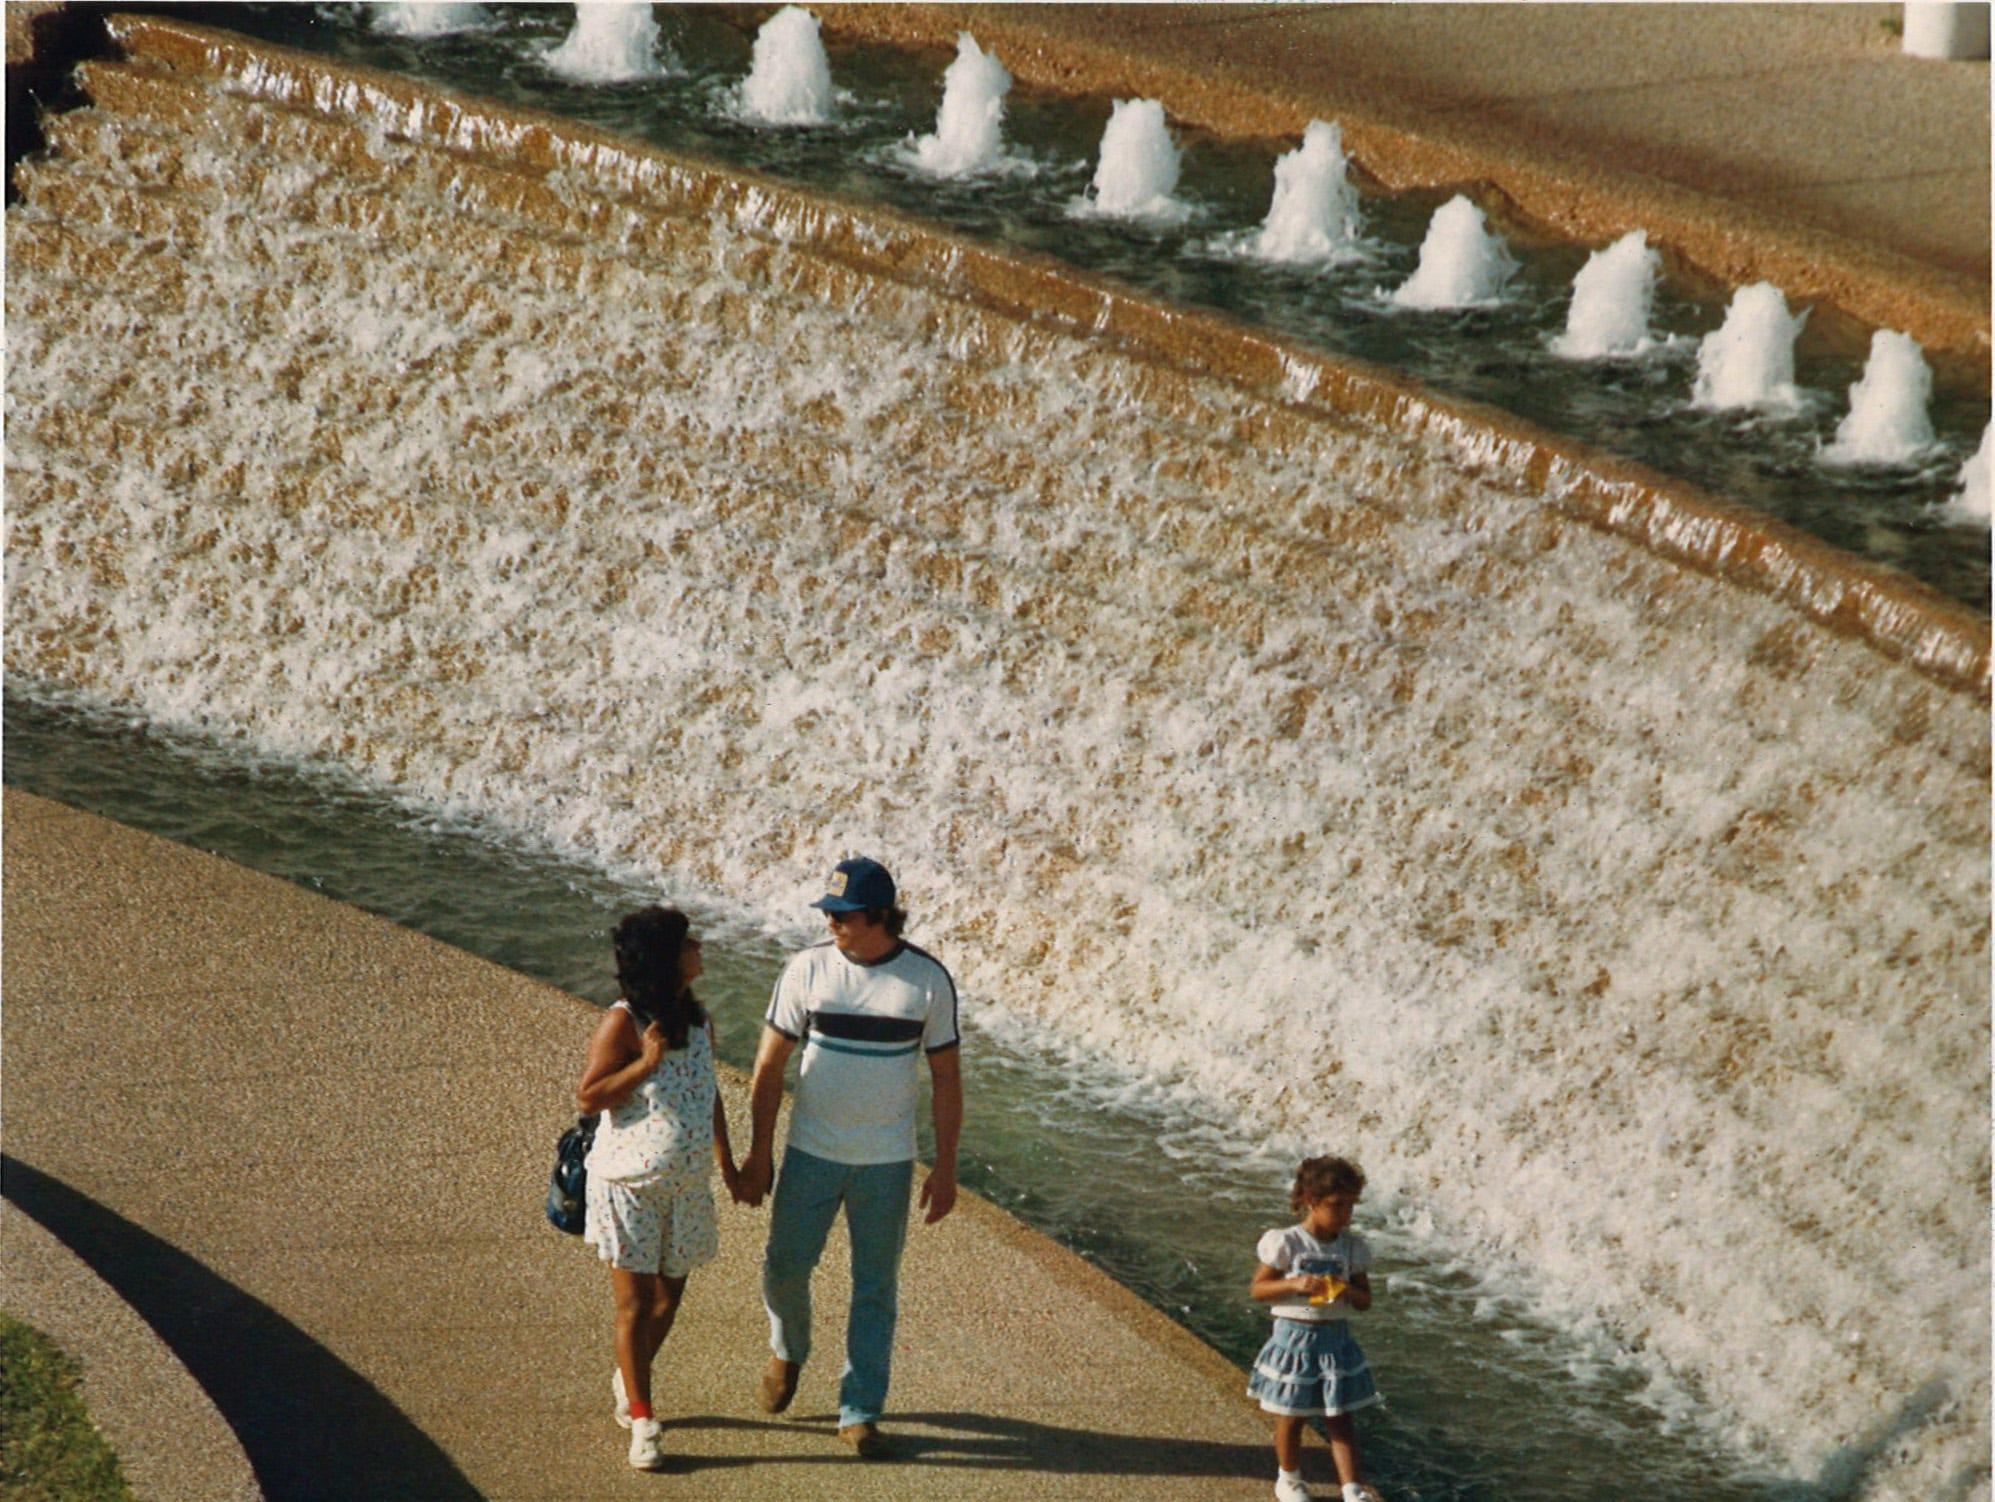 Visitors stroll through the Watergarden in Corpus Christi on Nov. 8, 1988.